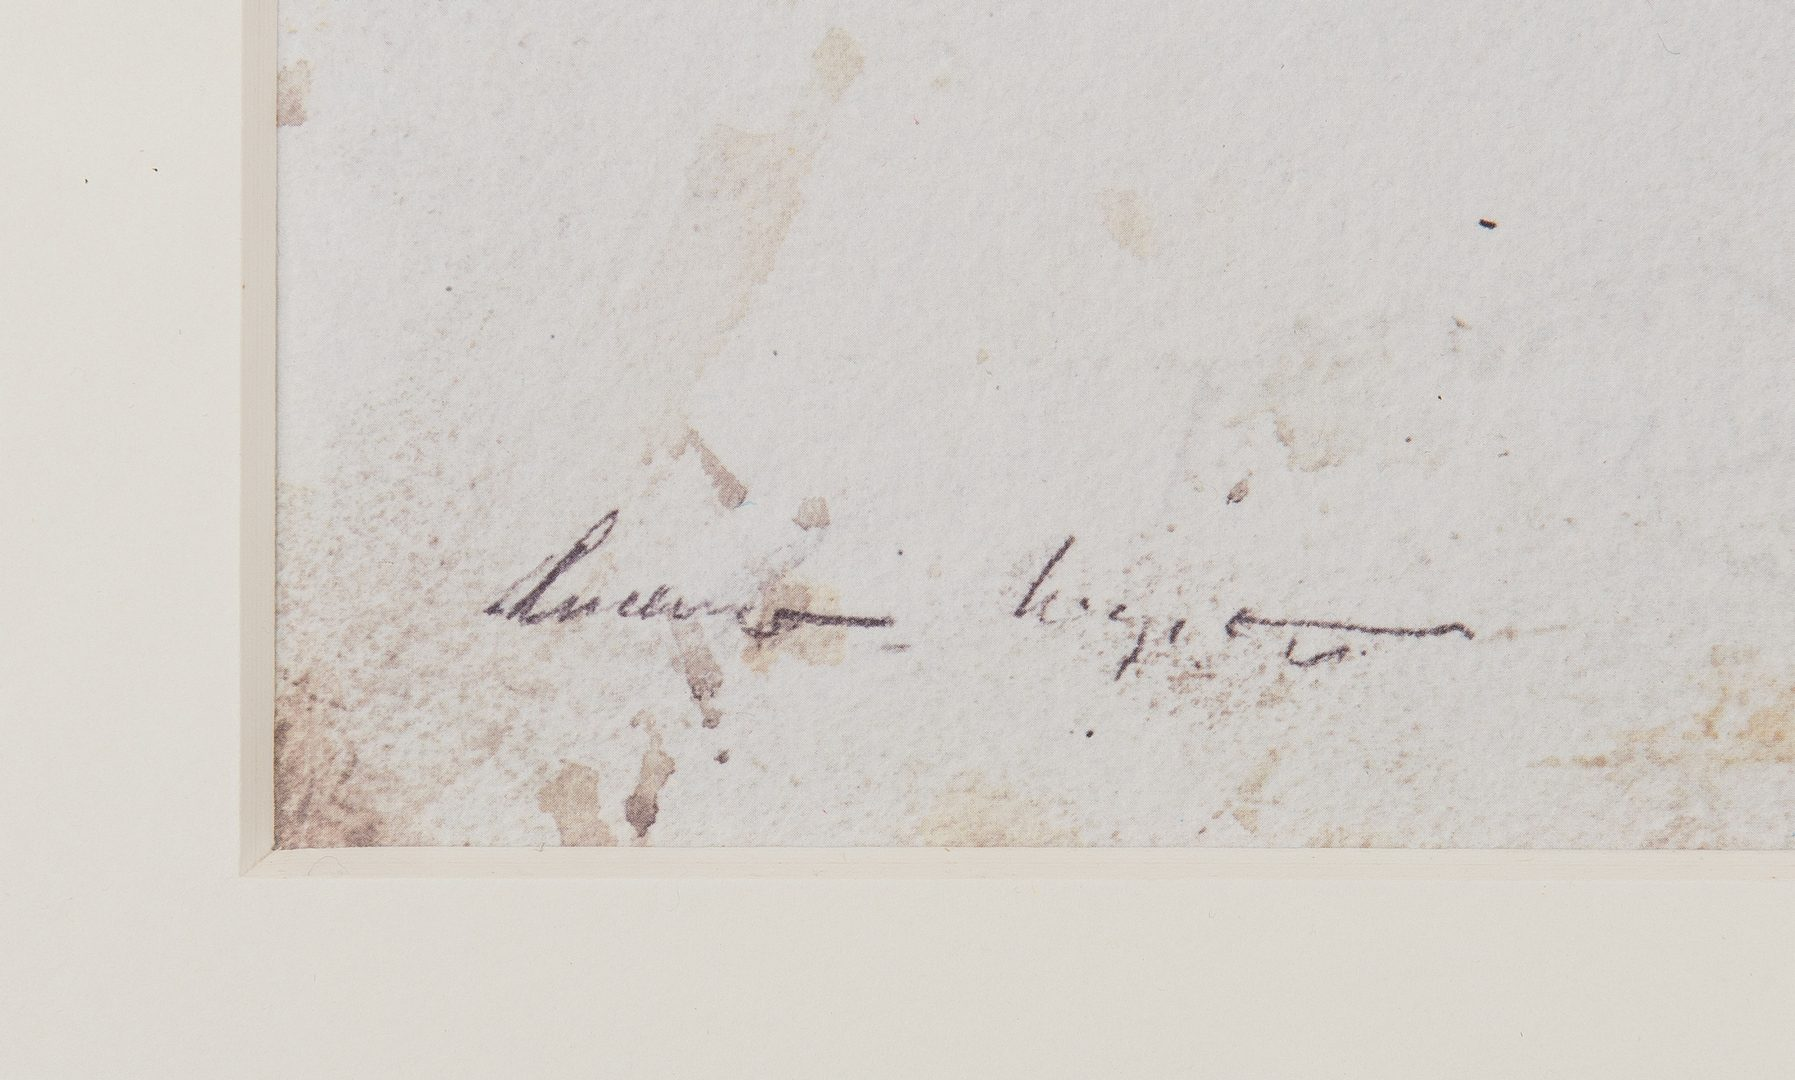 Lot 726: Andrew Wyeth Signed Print, North Light